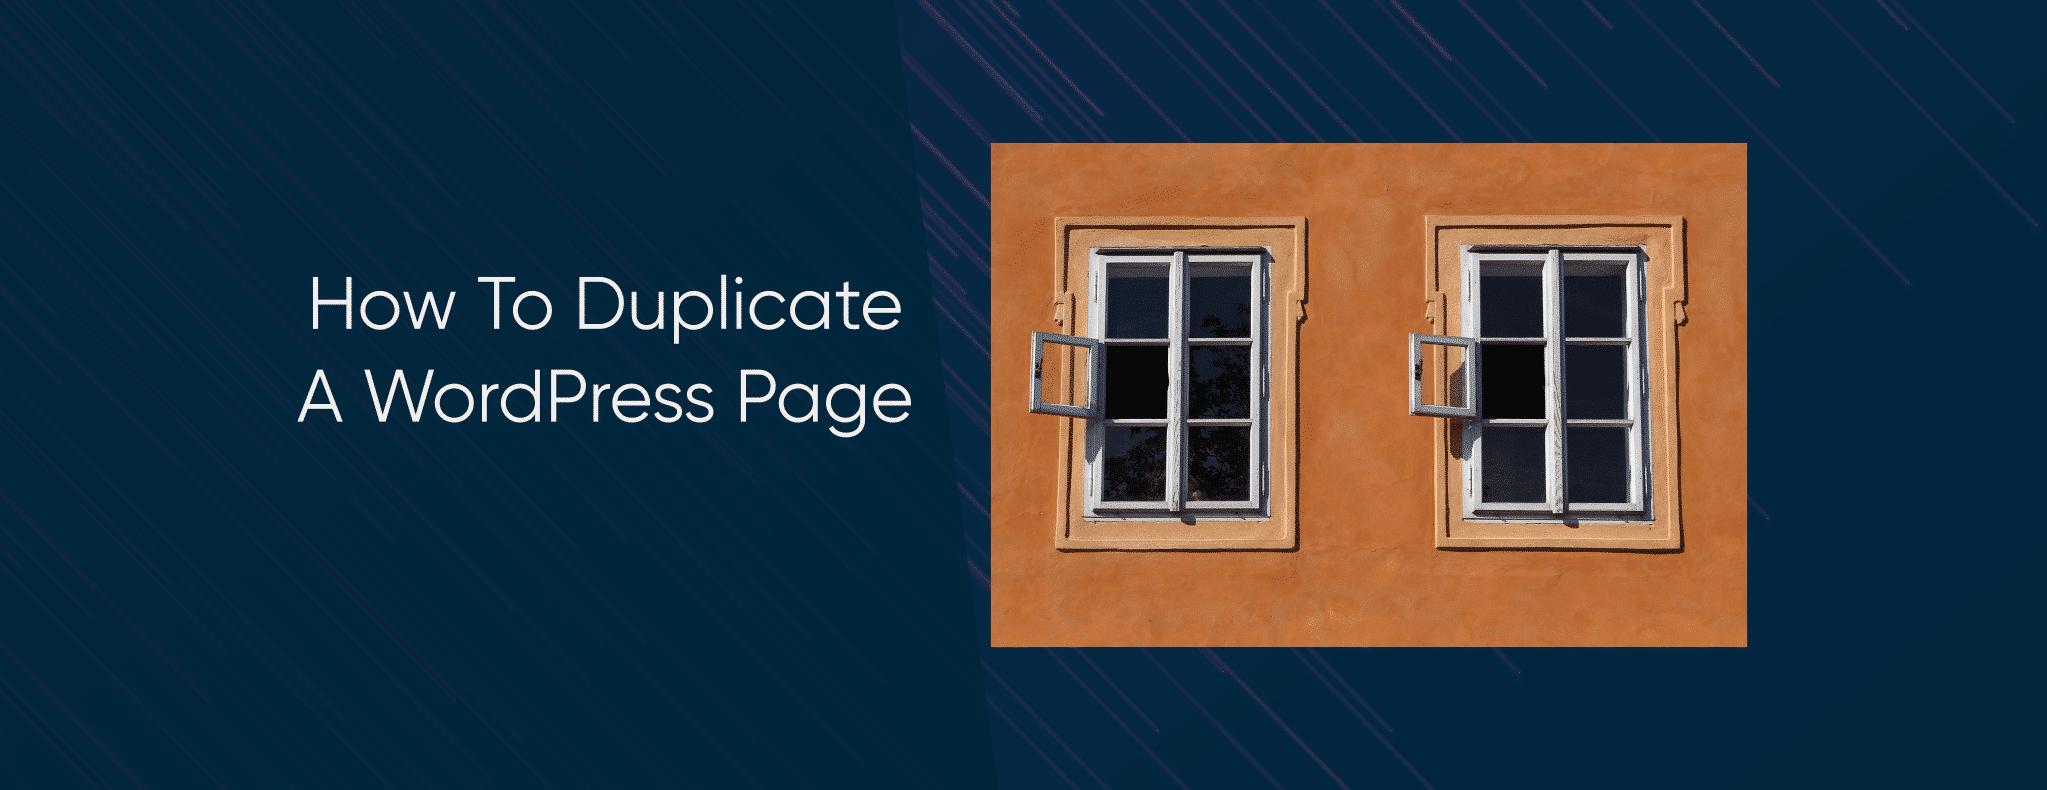 WordPress Care Plans How To Duplicate WordPress Page